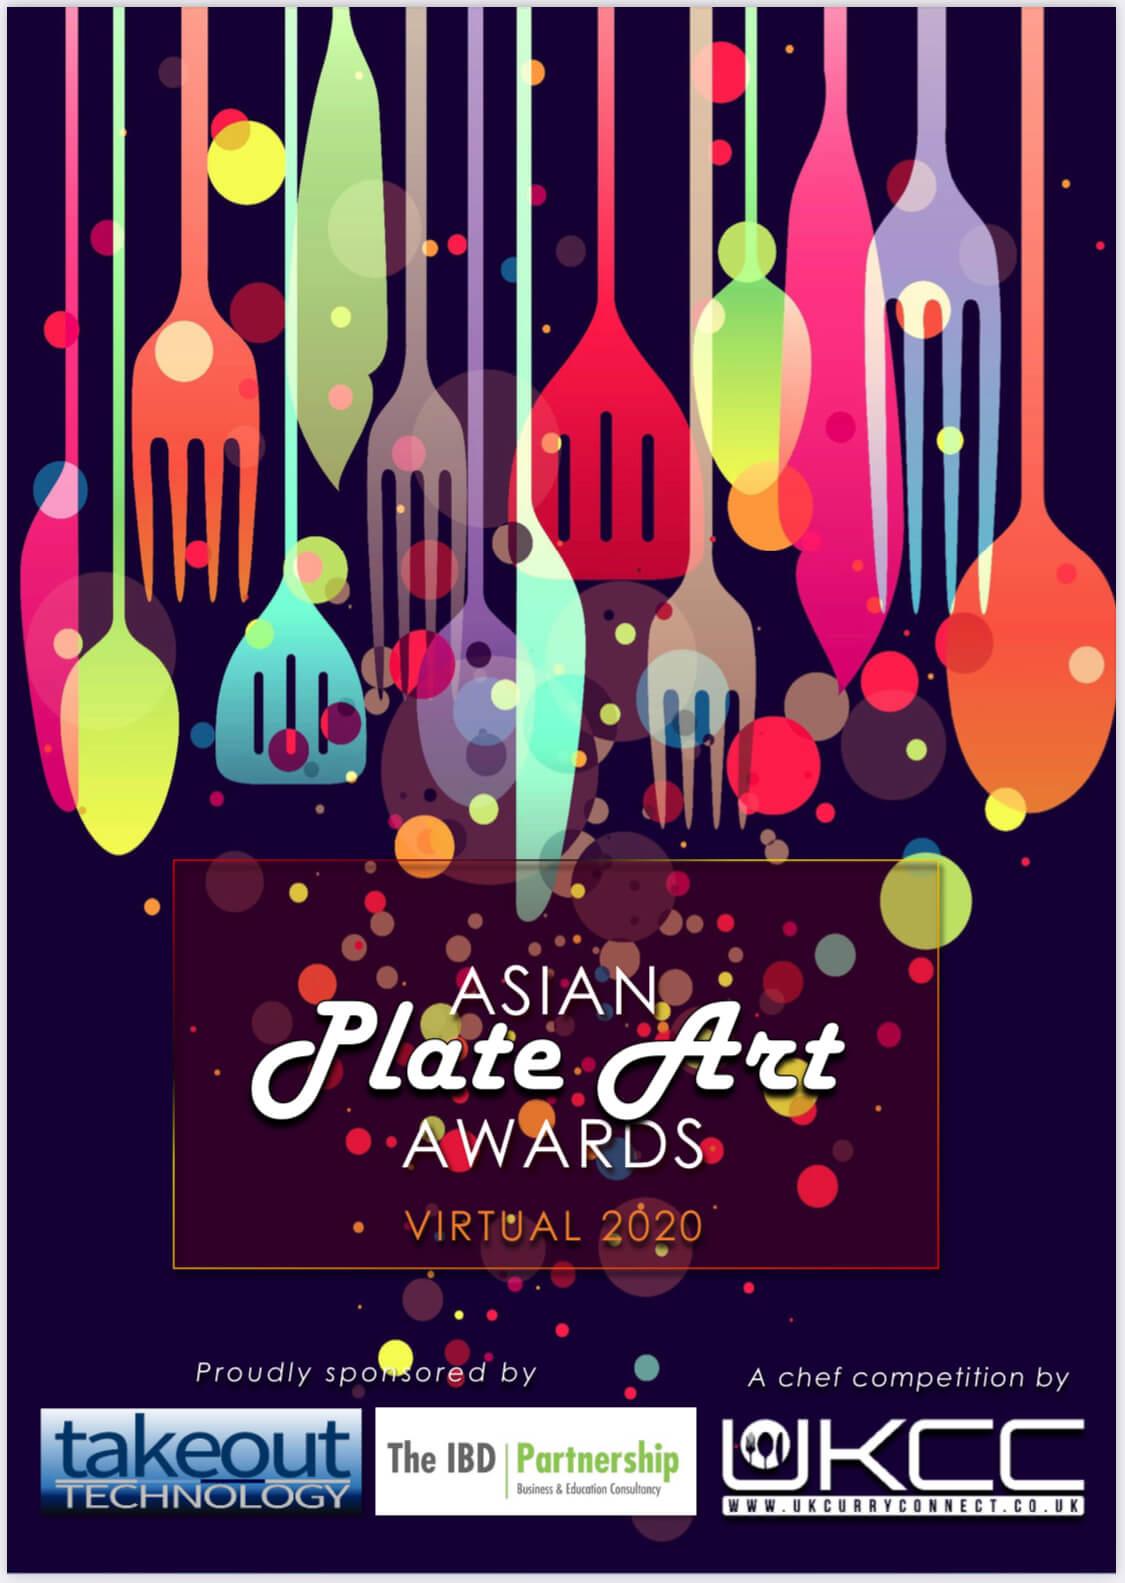 Asian Plate Art Awards – Virtual 2020